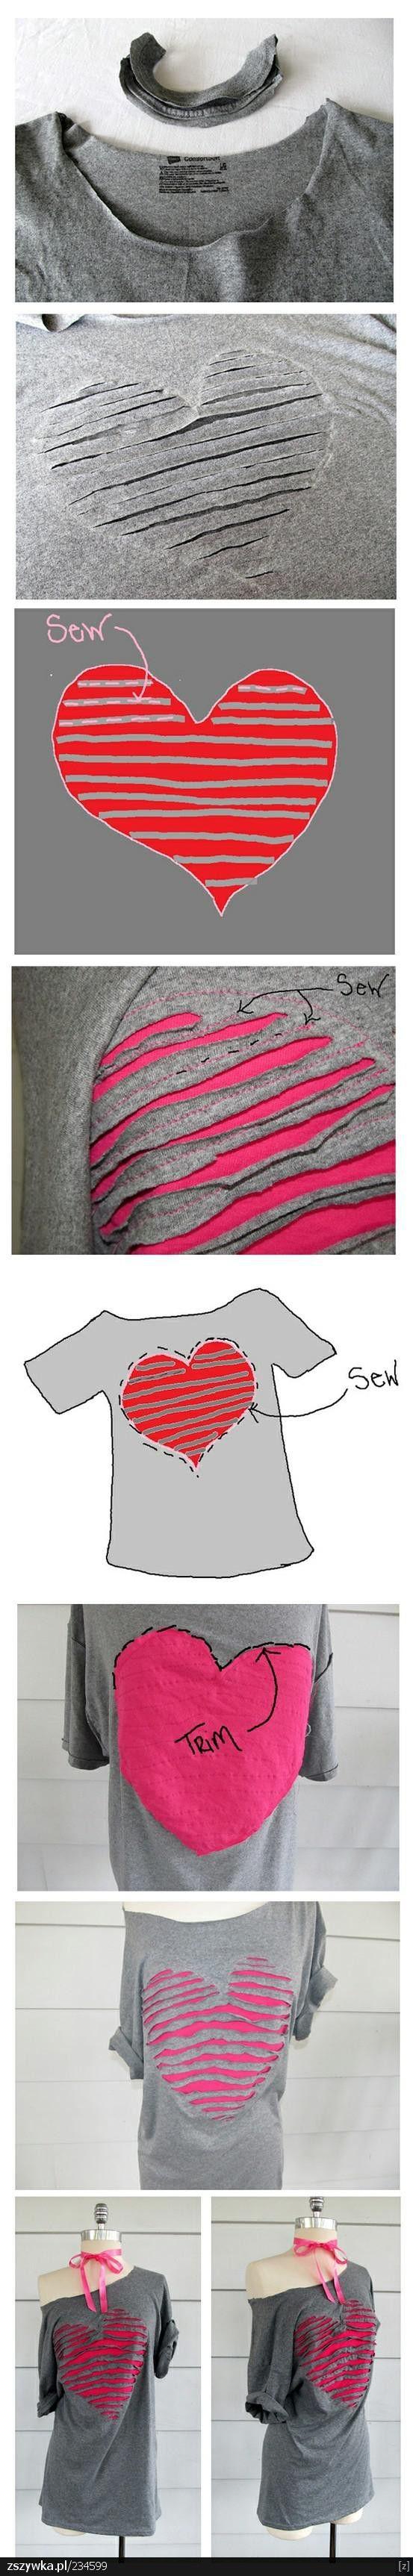 customizar camisola